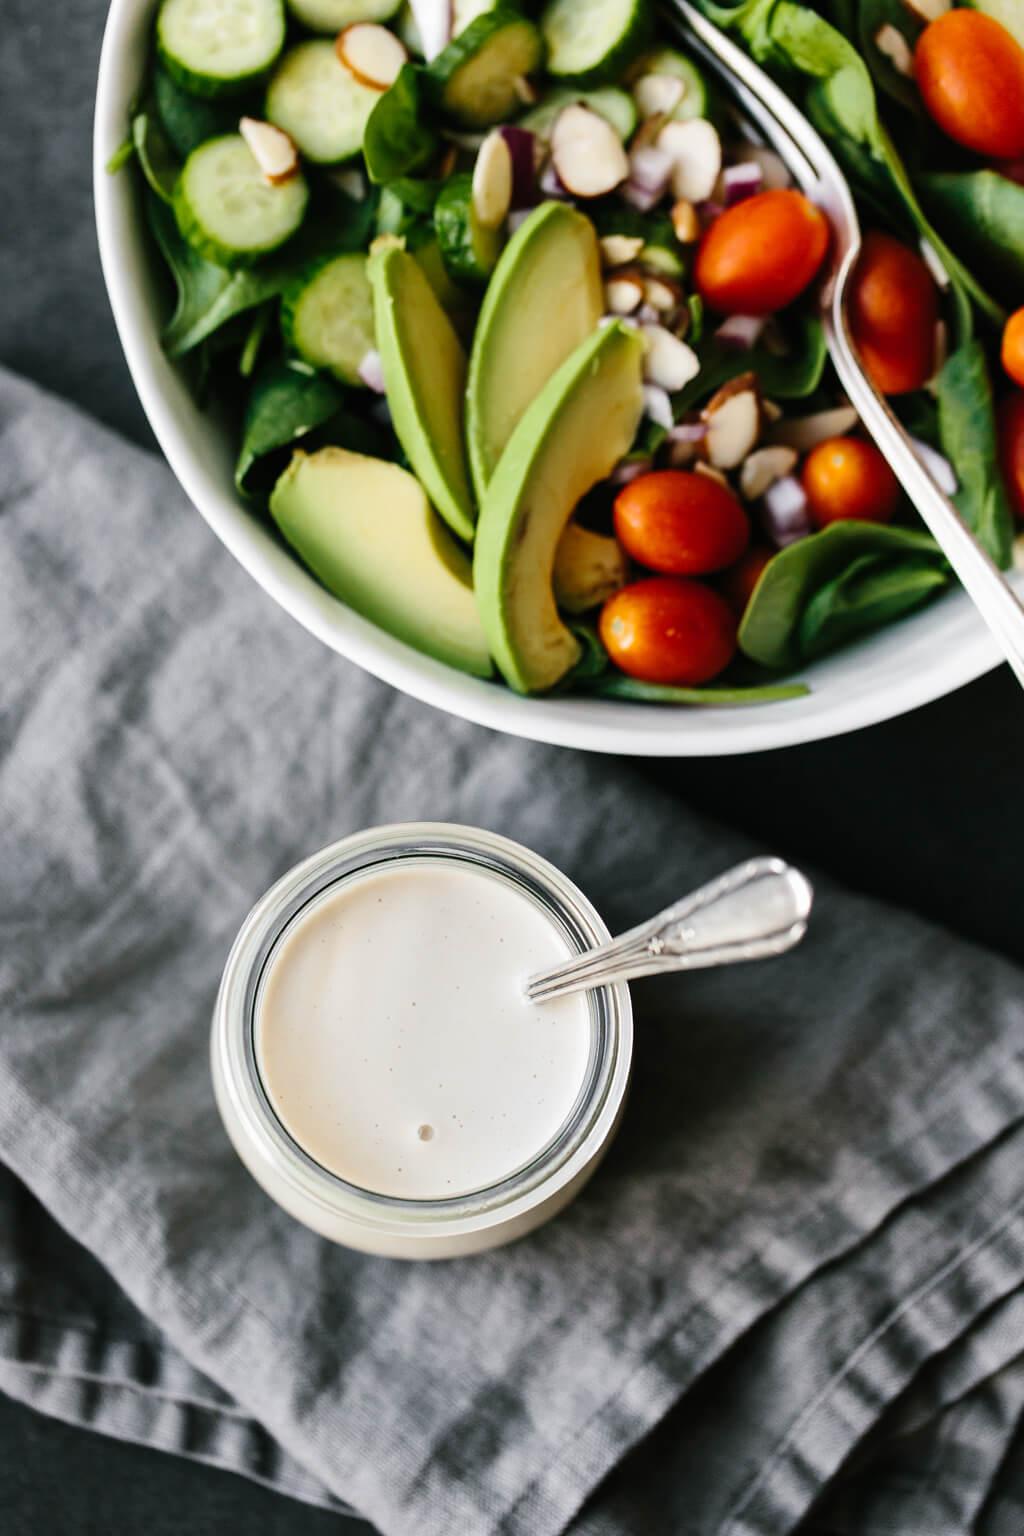 This lemon tahini dressing is oil-free, dairy-free and vegan. It's a tasty, creamy, zesty salad dressing that's super versatile and adaptable. #LemonTahiniDressing #Tahini